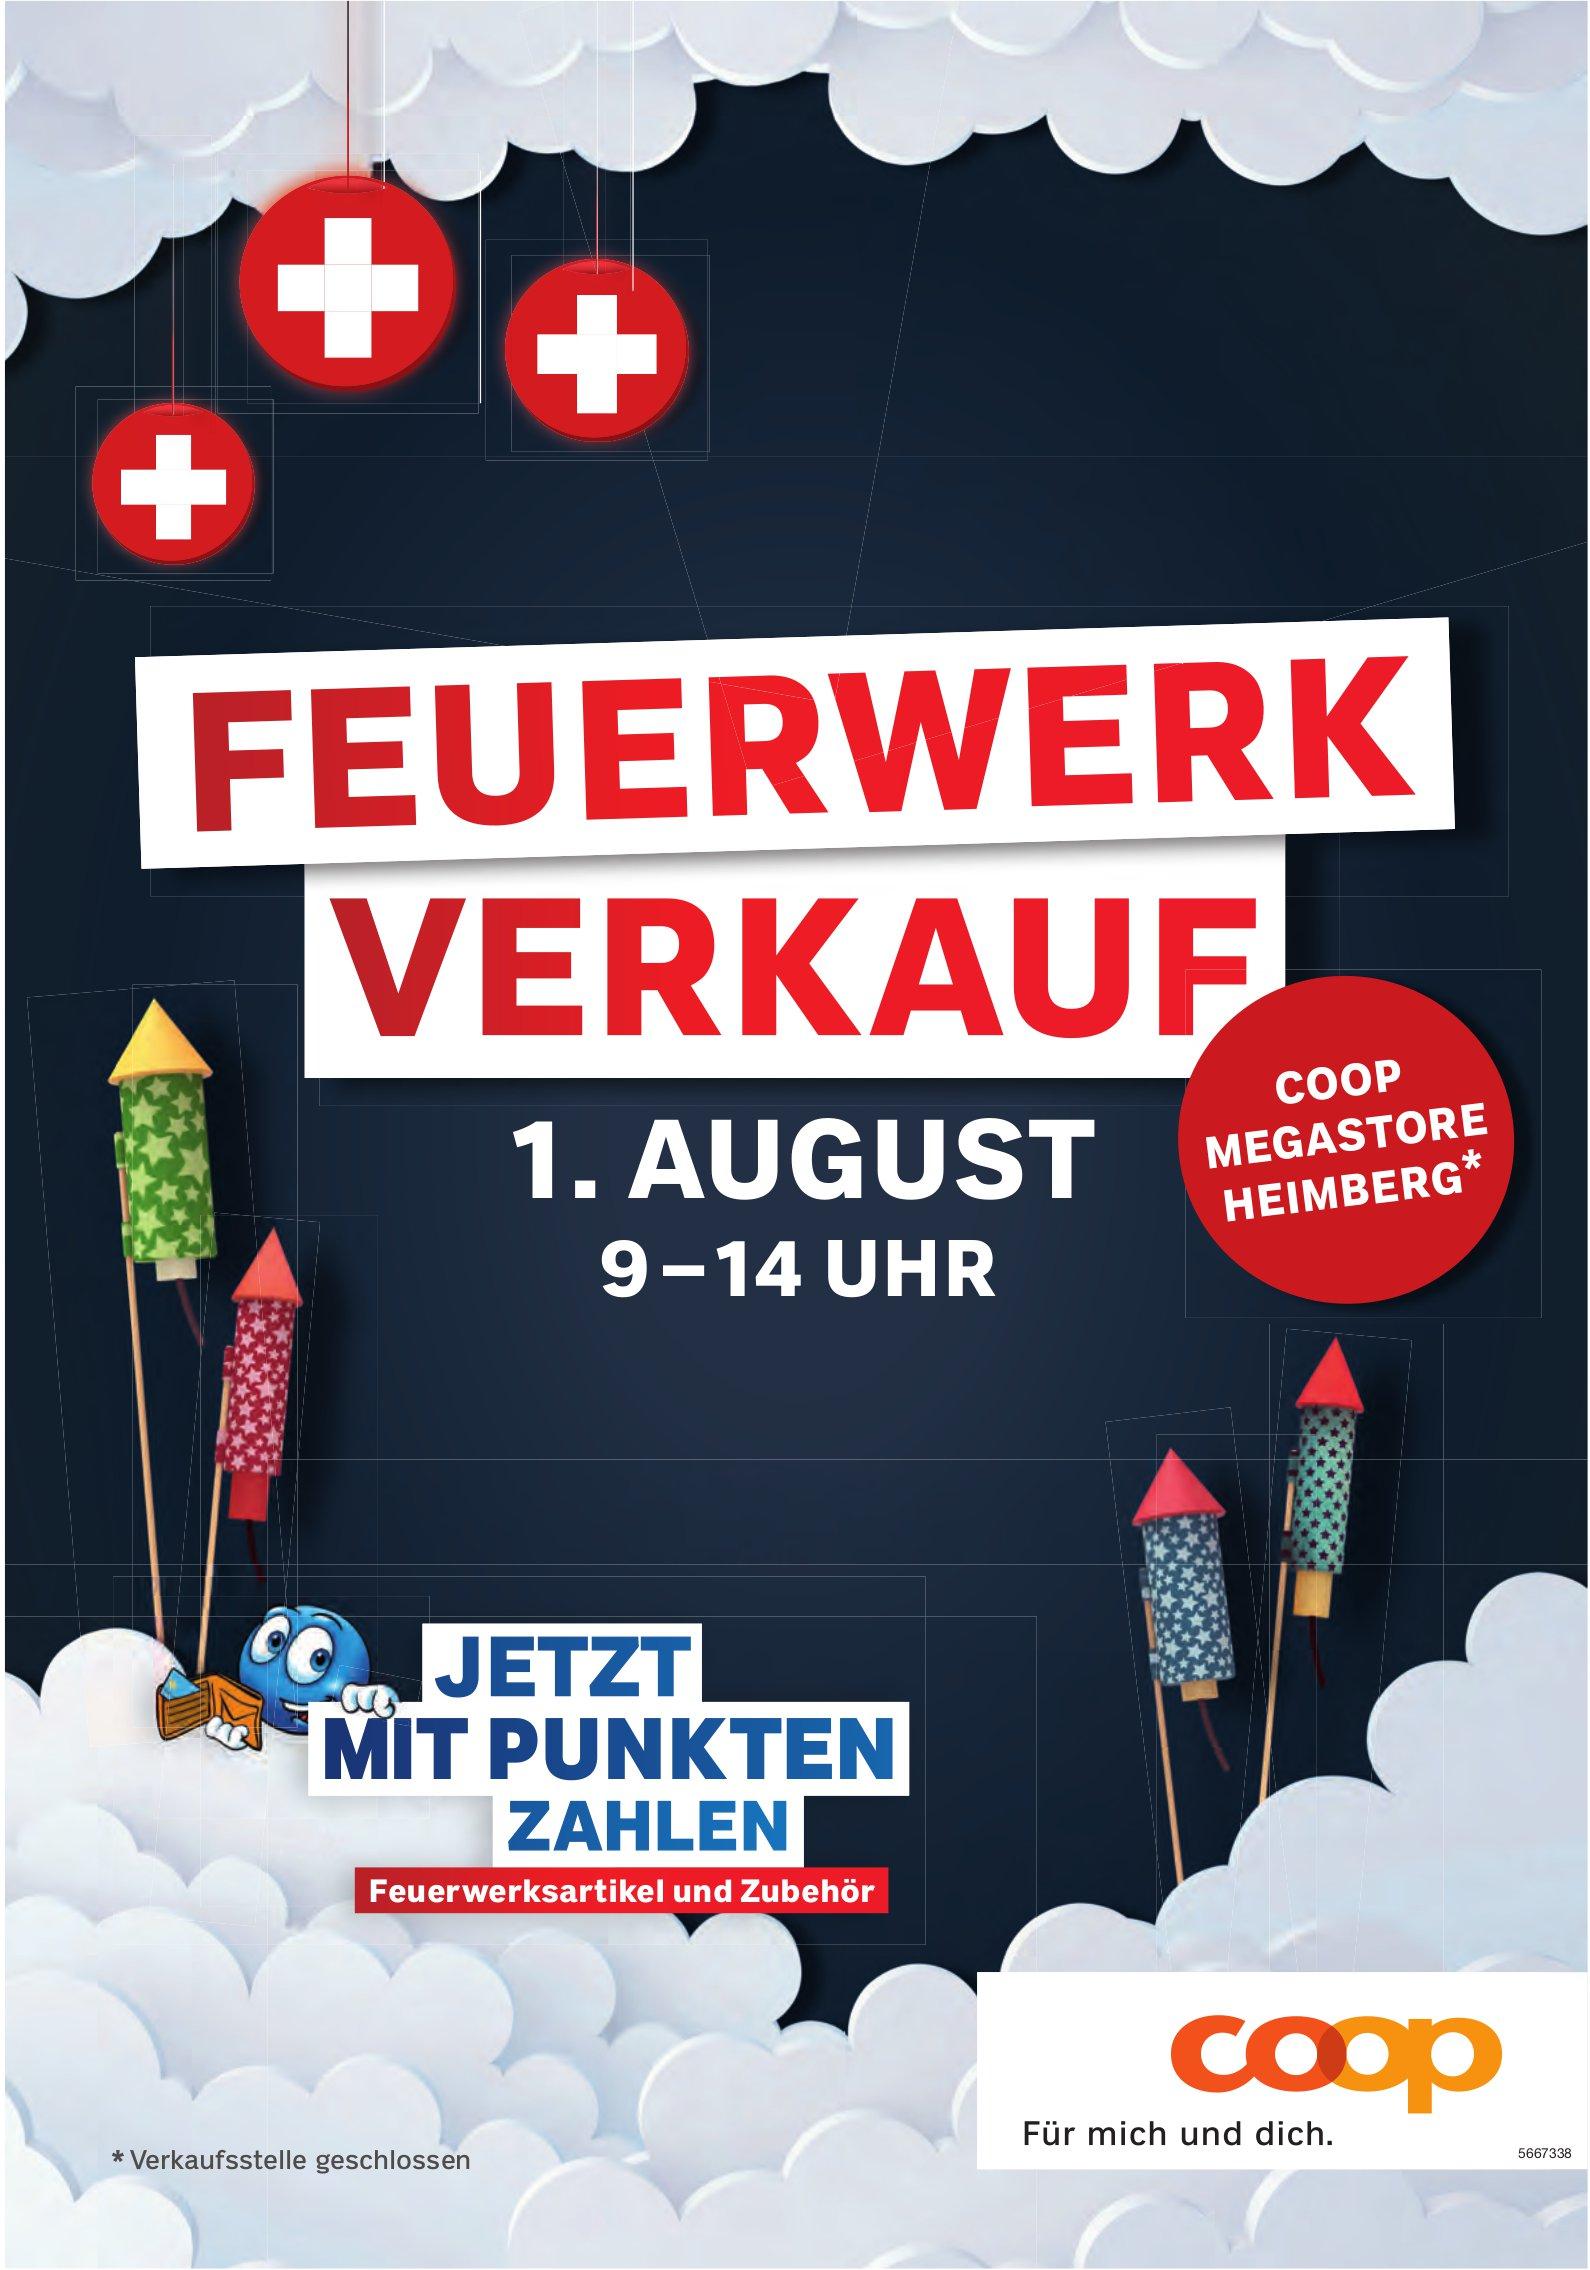 Feuerwerk Verkauf, 1. August, Coop Megastore Heimberg